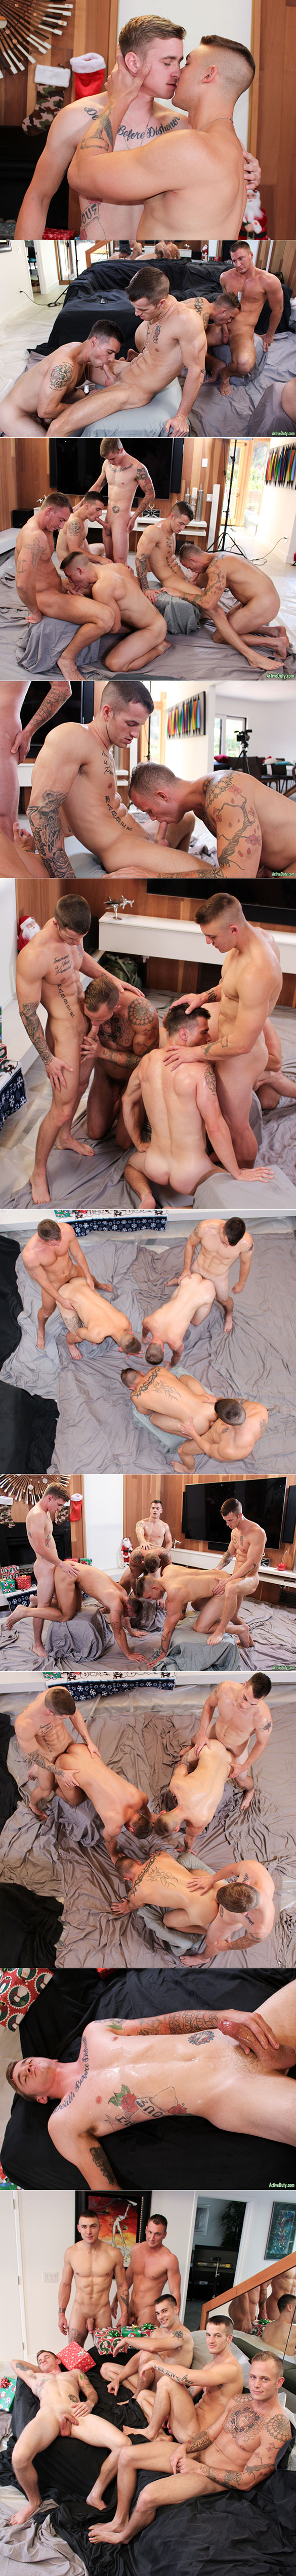 Active Duty: Quentin Gainz, Craig Cameron, Ryan Jordan, Ripley, Princeton Price and Zack Matthews' raw christmas orgy